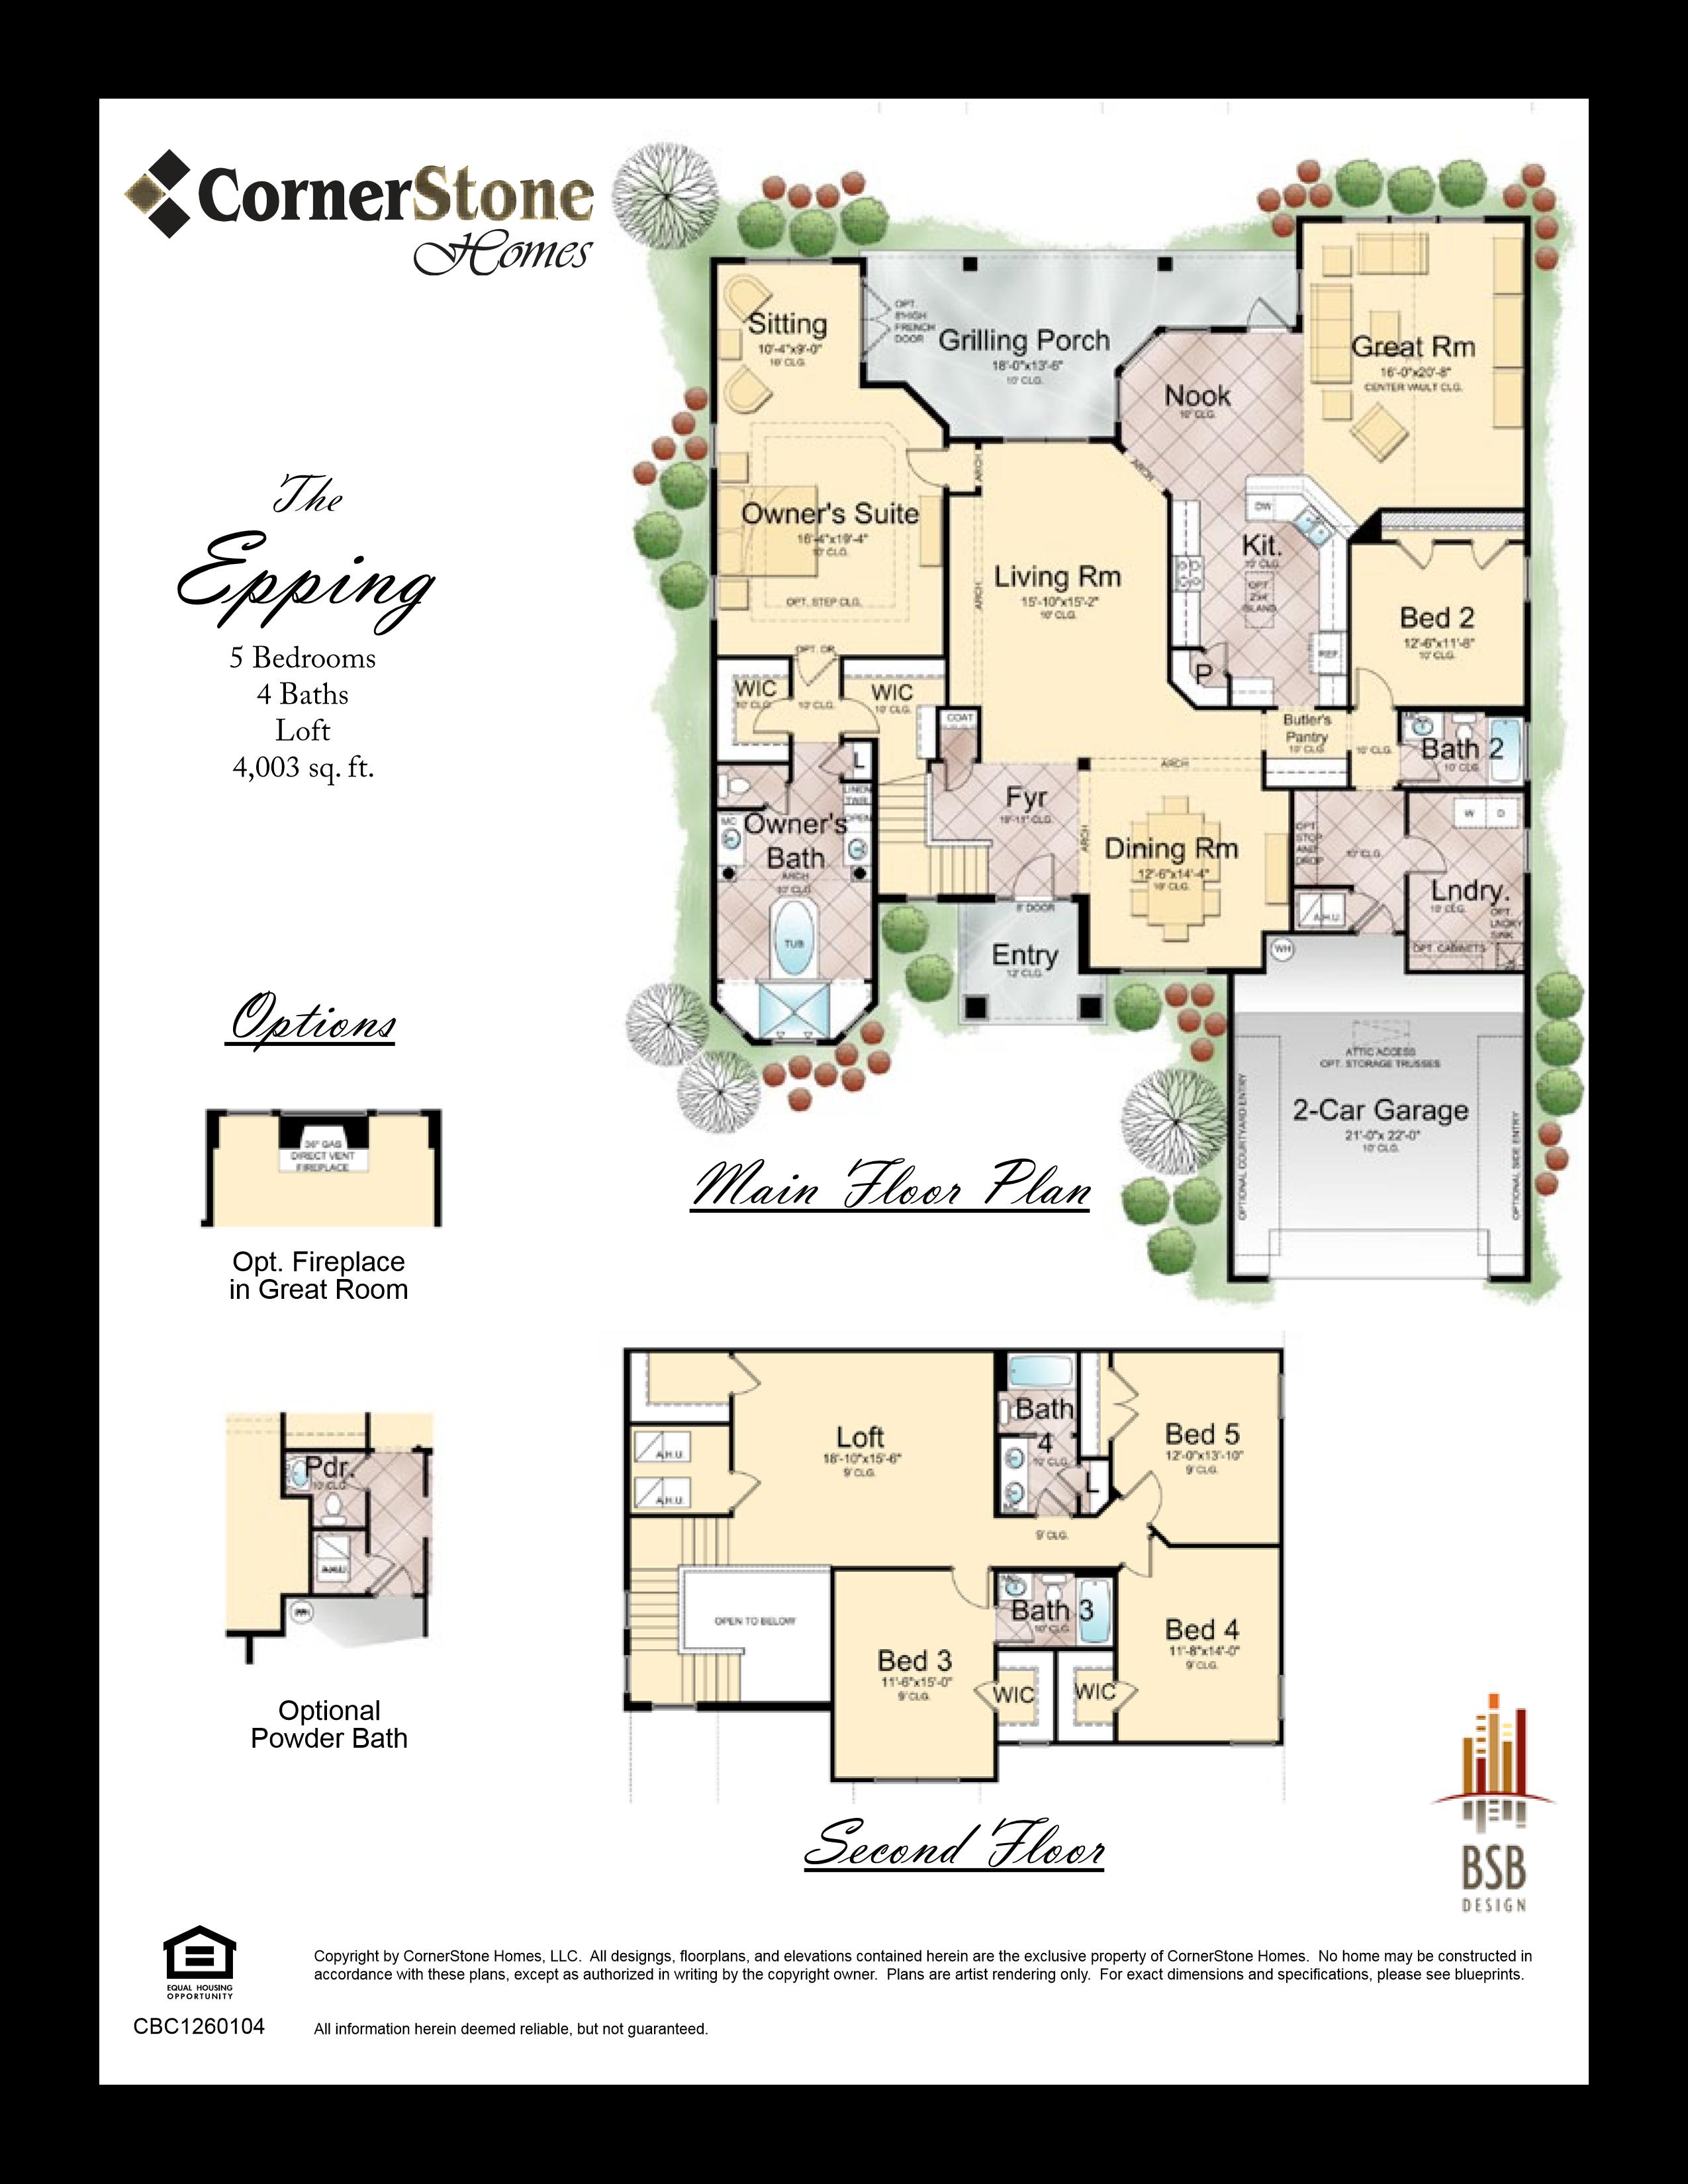 Floor Plan Epping Cornerstone Homes Floor Plans House Floor Plans How To Plan